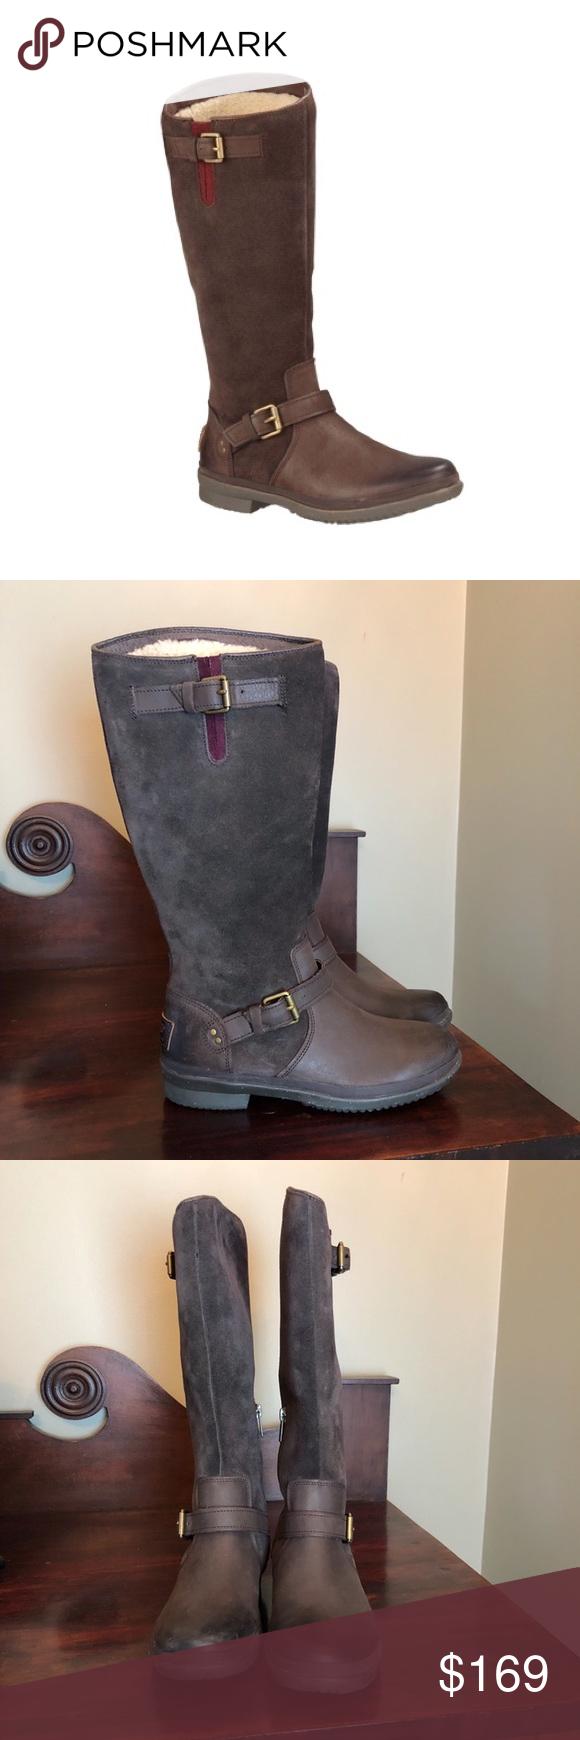 269729722a6 NWOB UGG 'Thomsen' Waterproof Leather Boot Size 6 NWOB UGG 'Thomsen ...